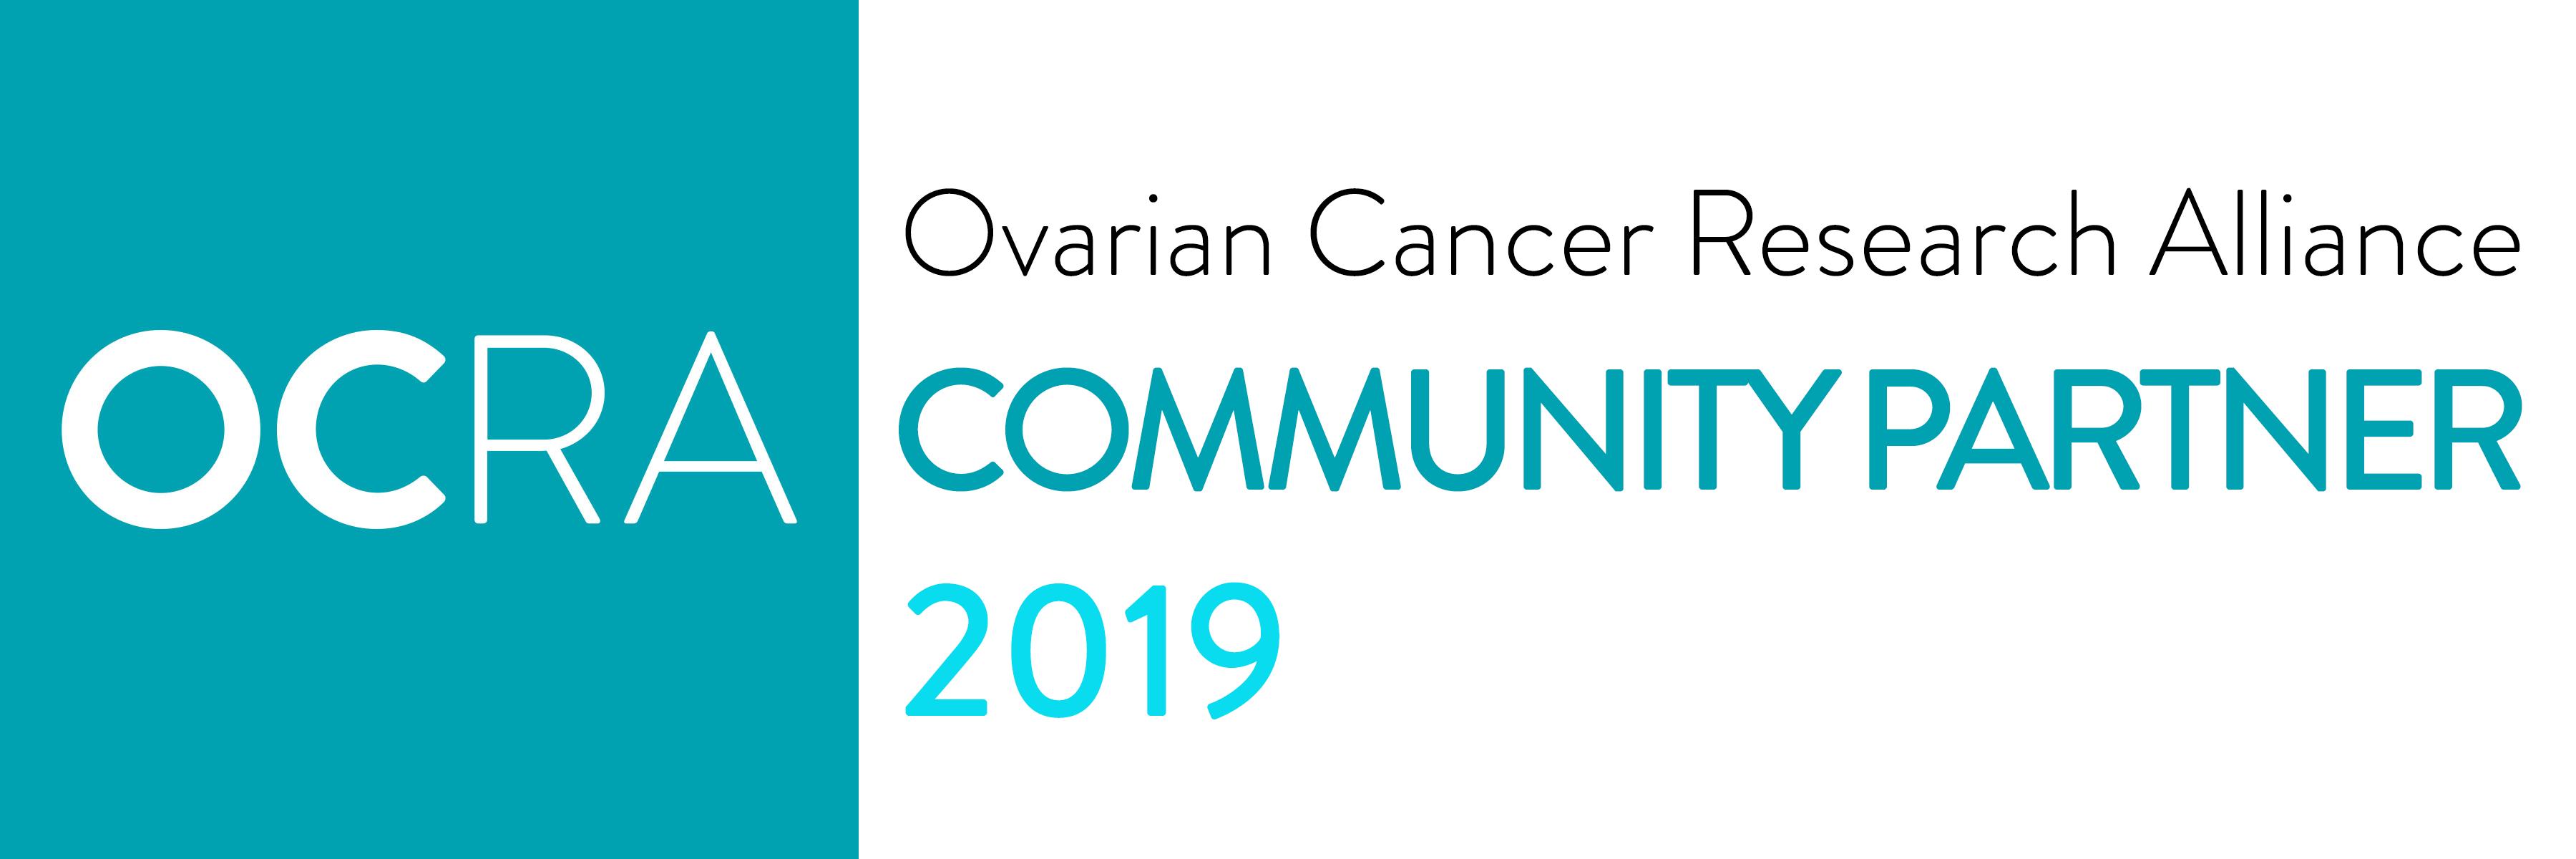 Ovarian Cancer Research Fund Alliance